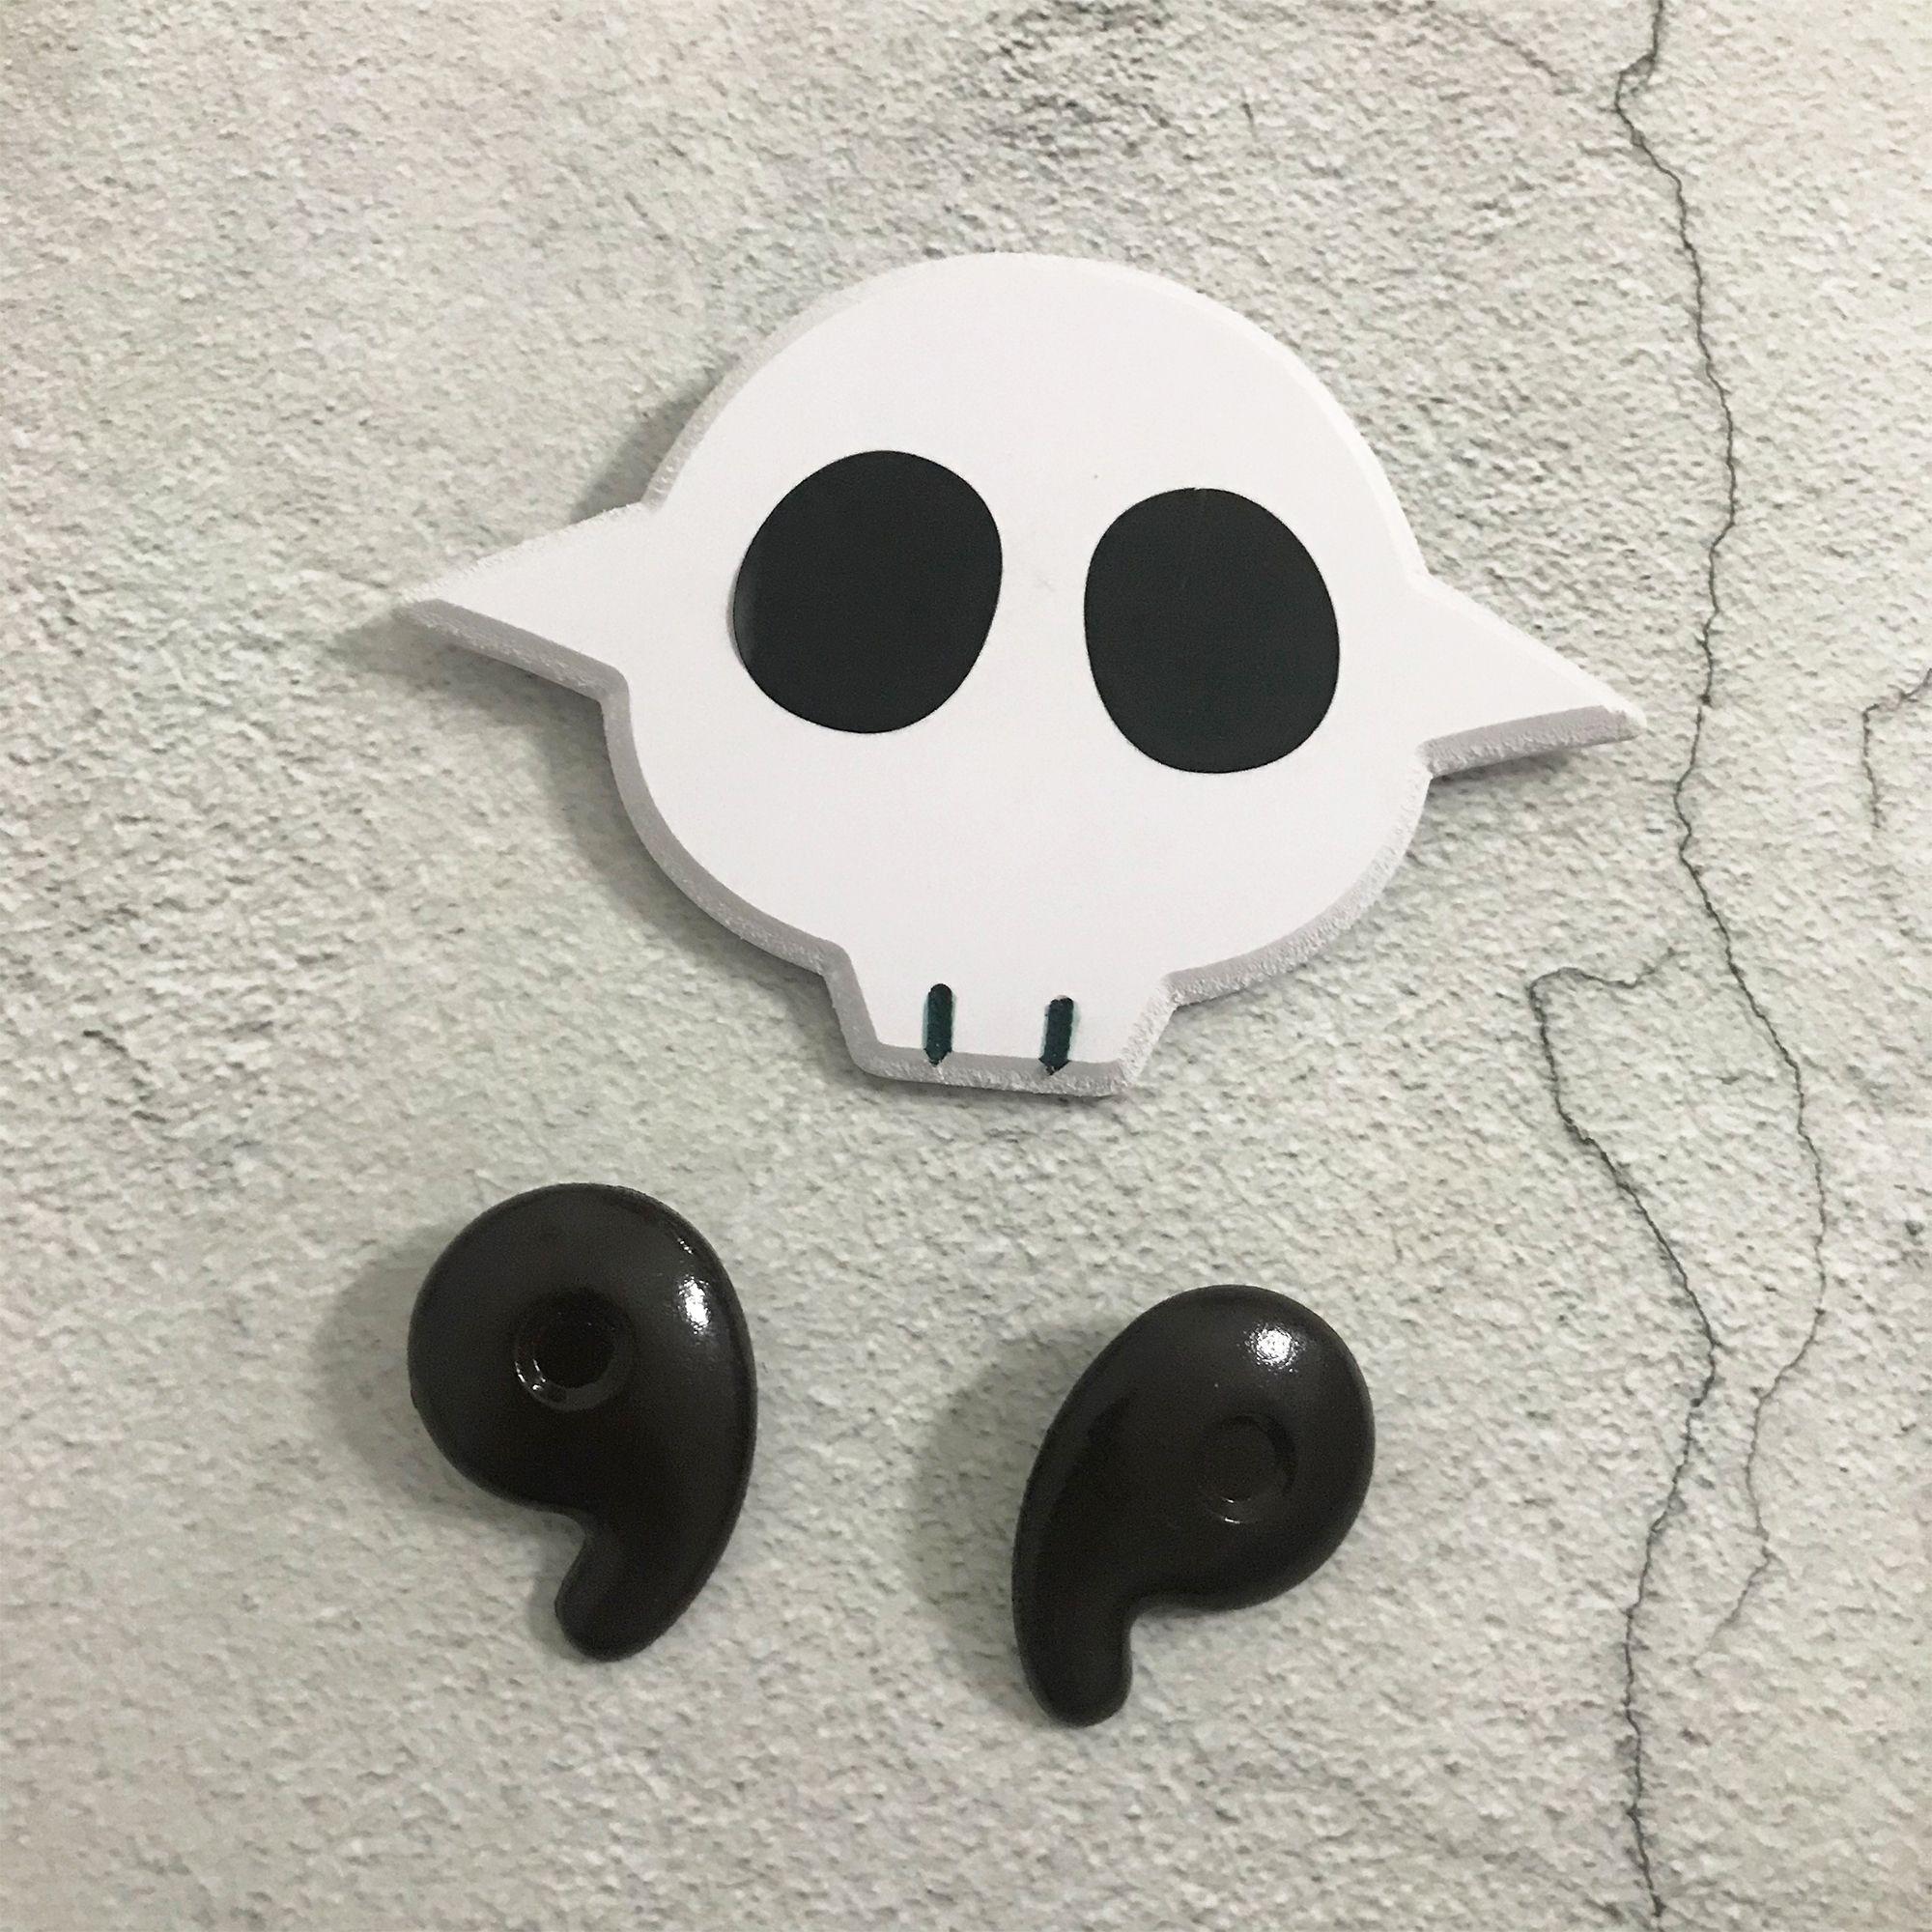 Toilet Bound Jibaku Shounen Hanako Kun Nene Yashiro Cosplay Props Skull Pin Badge Hair Clips Accessories In 2020 Cosplay Props Cosplay Skull Pin